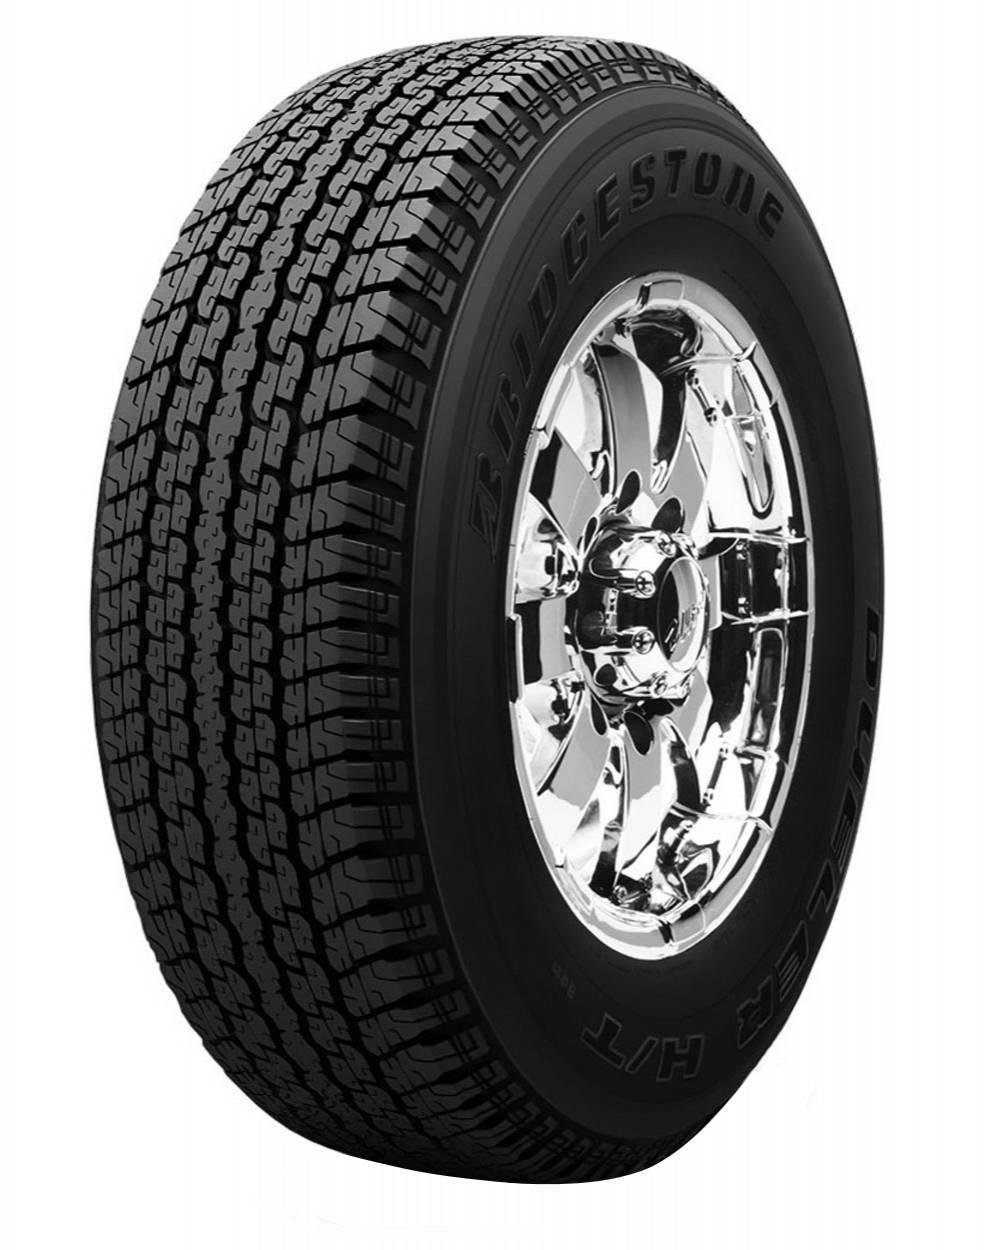 Pneu Bridgestone Dueler H/T 840 265/70 R16 112S - Cantele Centro Automotivo